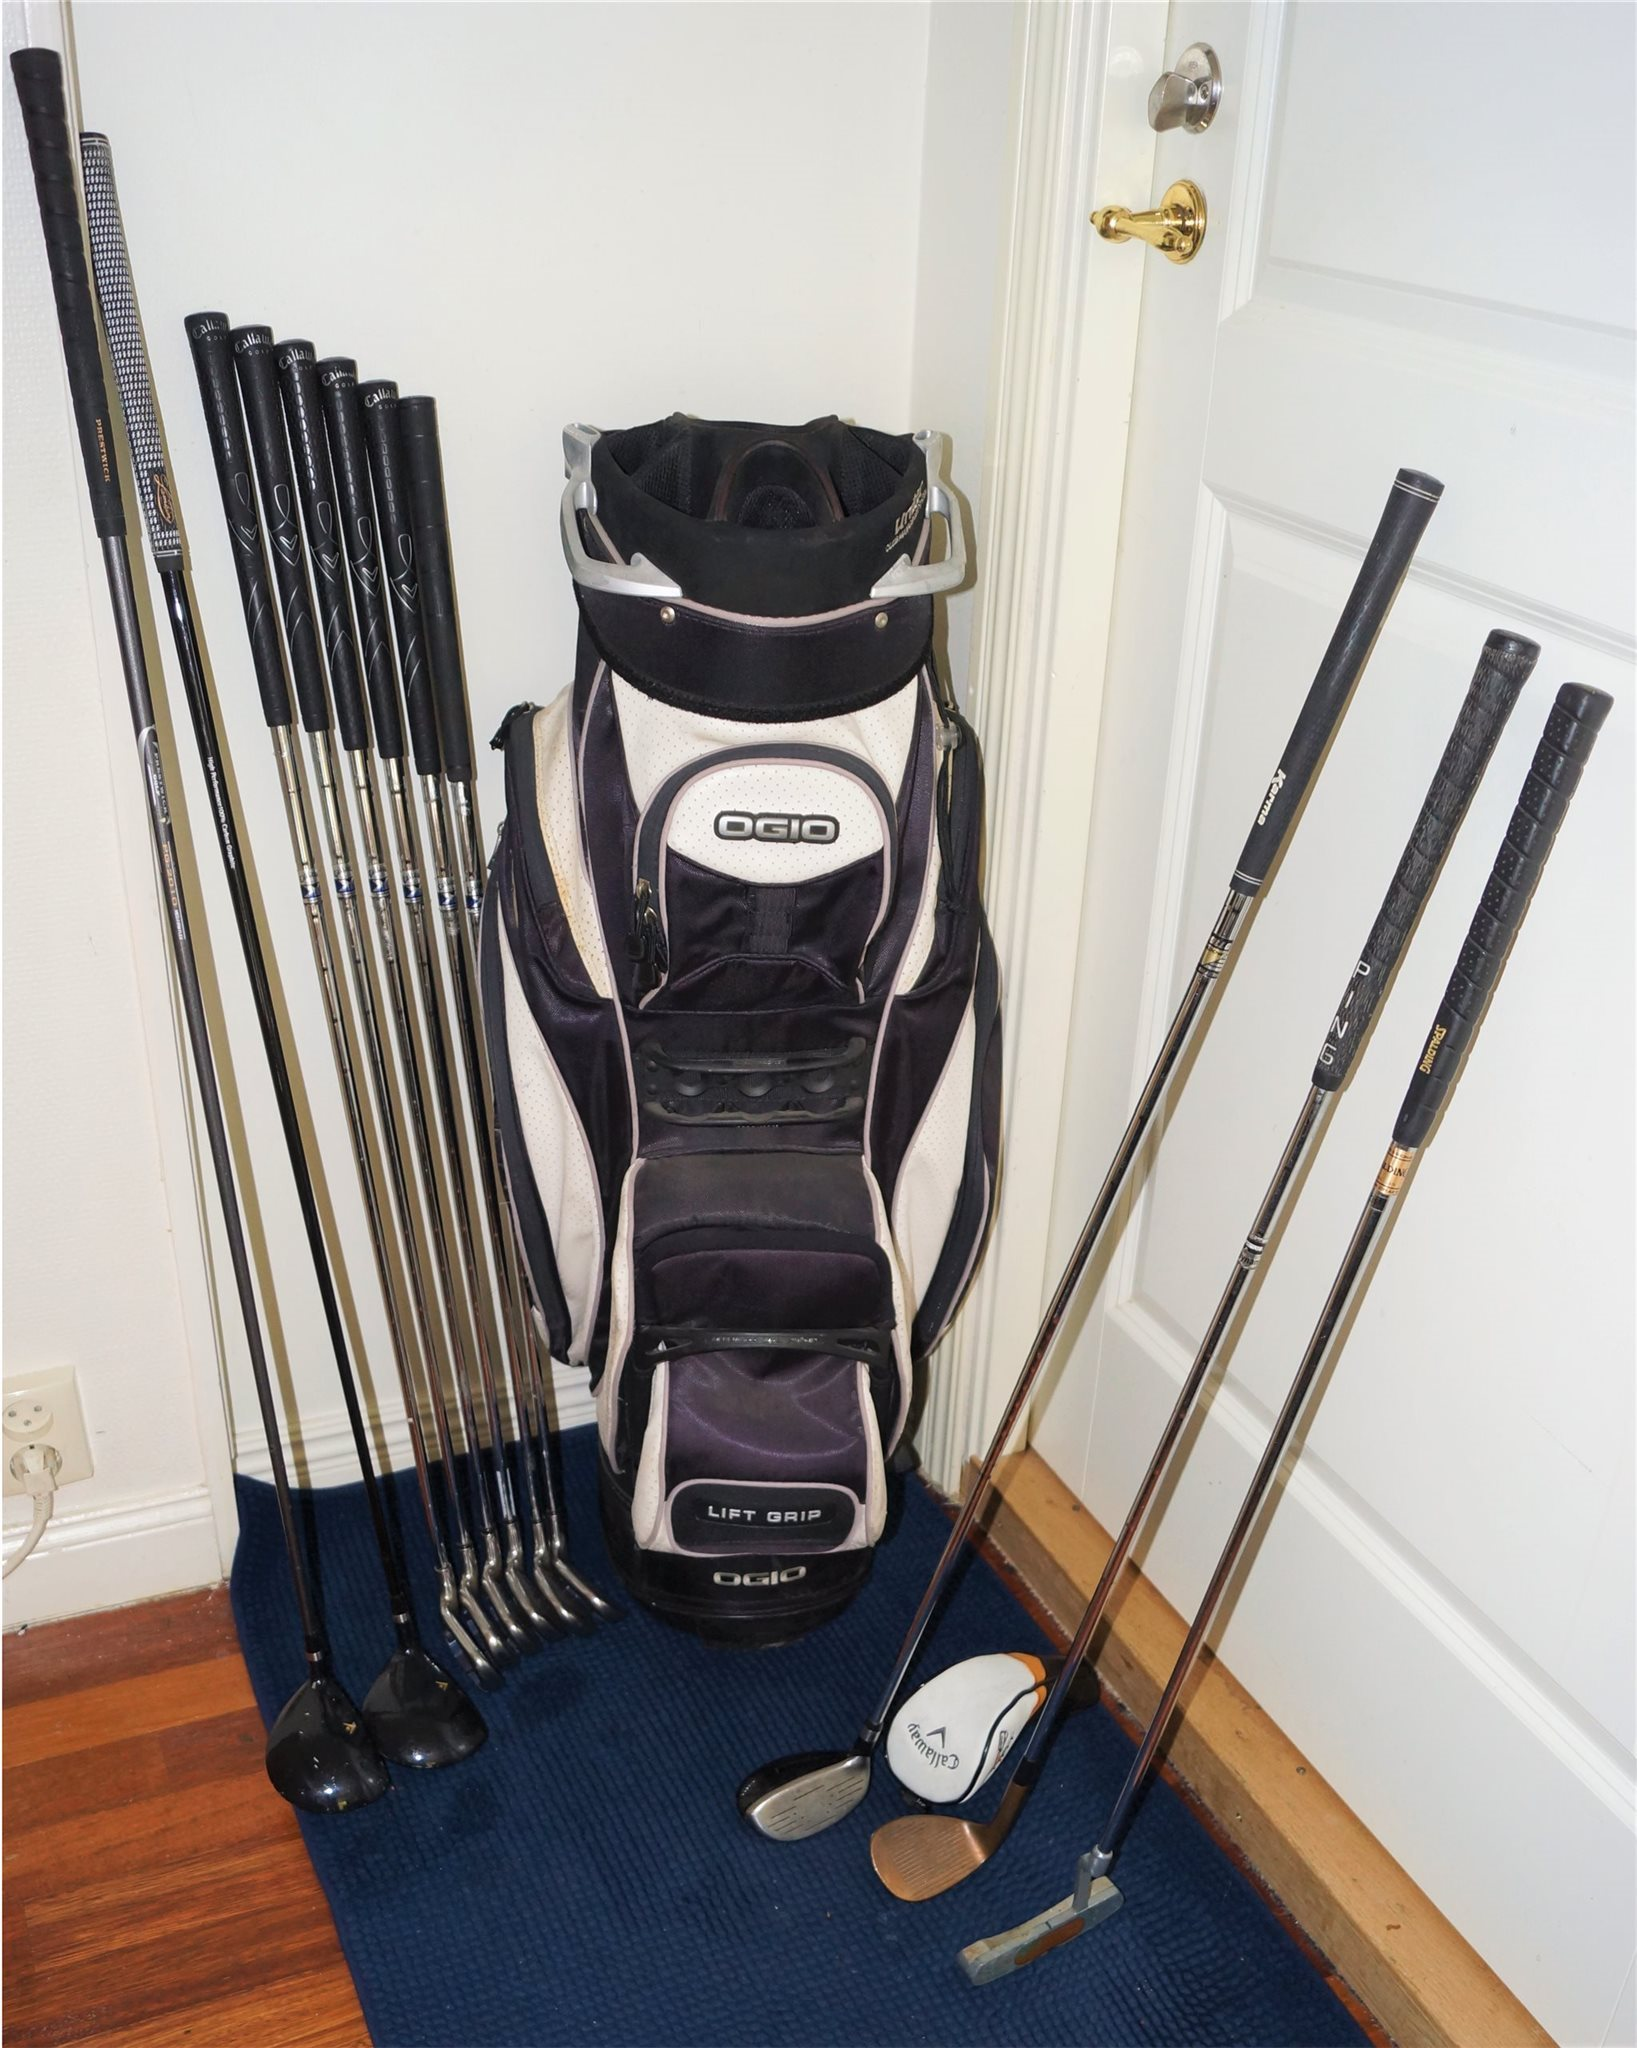 järnklubba i golfset